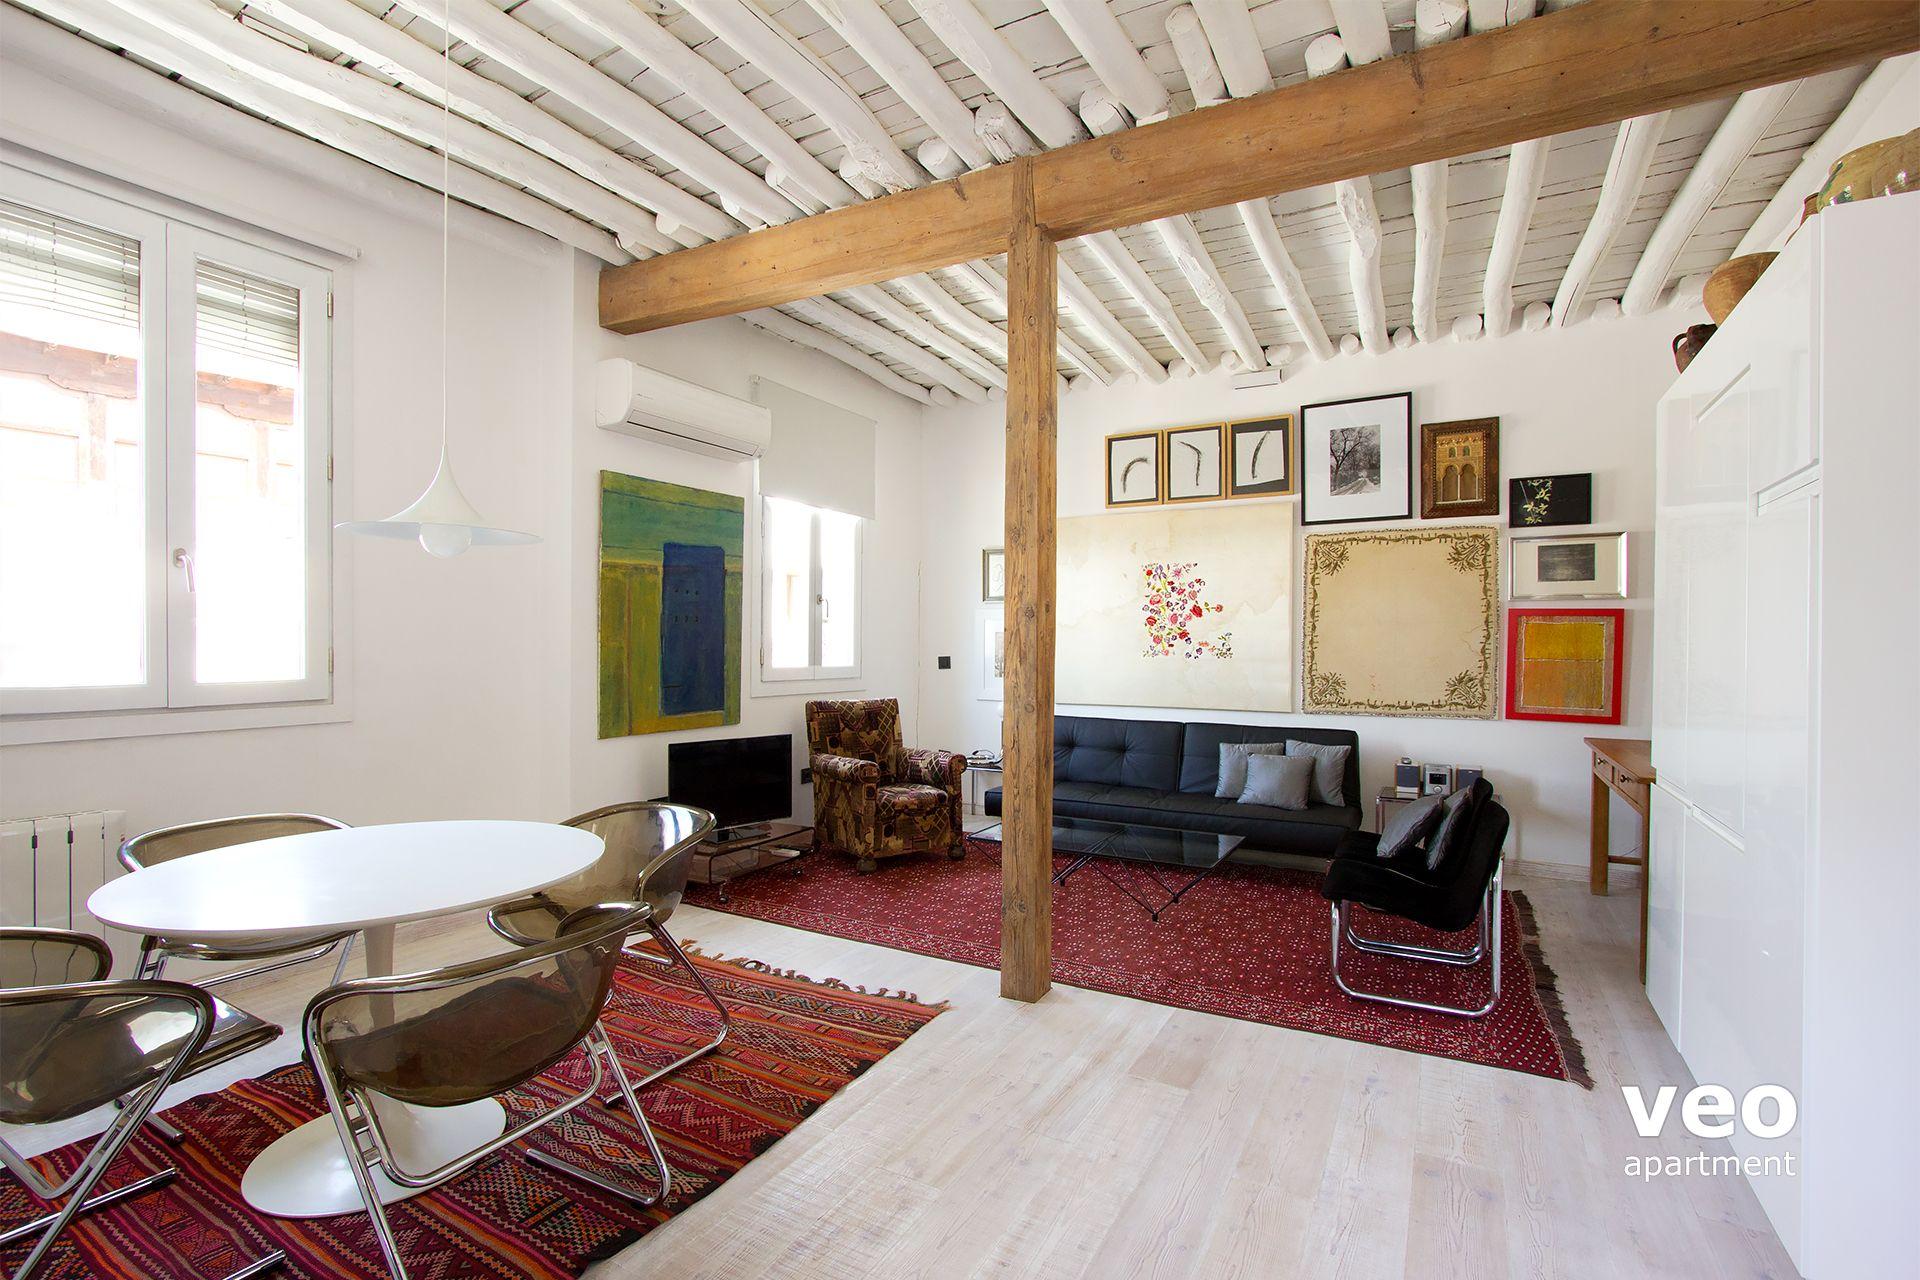 Appartement Rue Carnero S Ville Espagne Carnero Location D  # Meubles Cafe Kilkenny